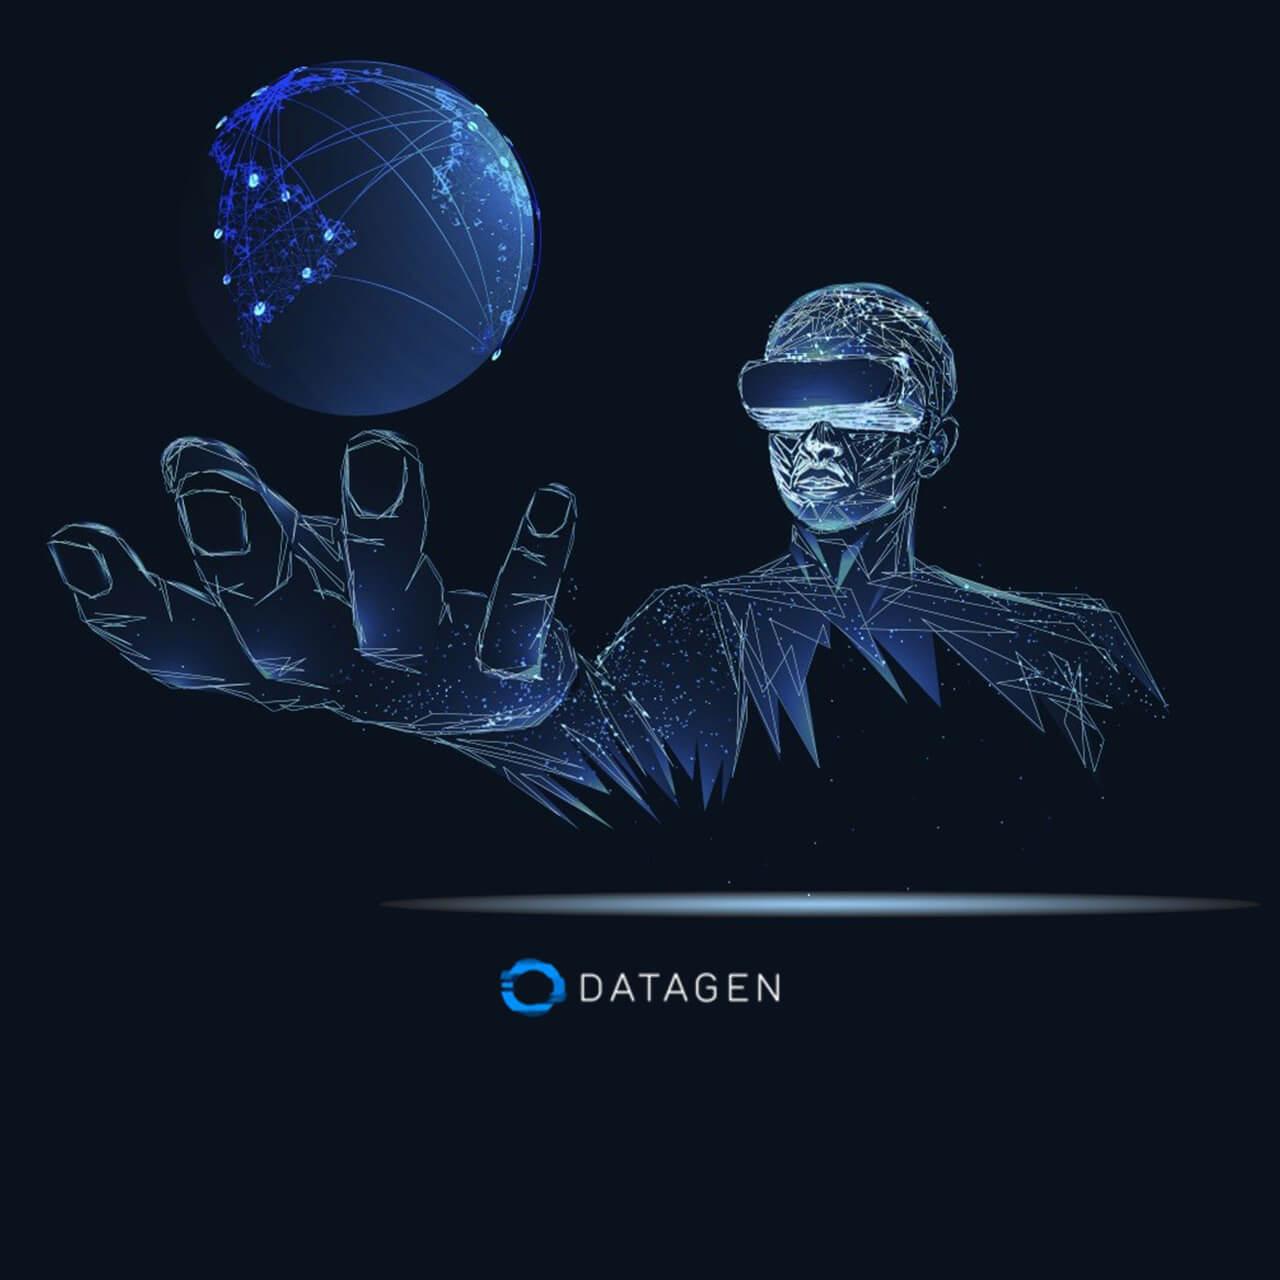 datagen-featured-image3-